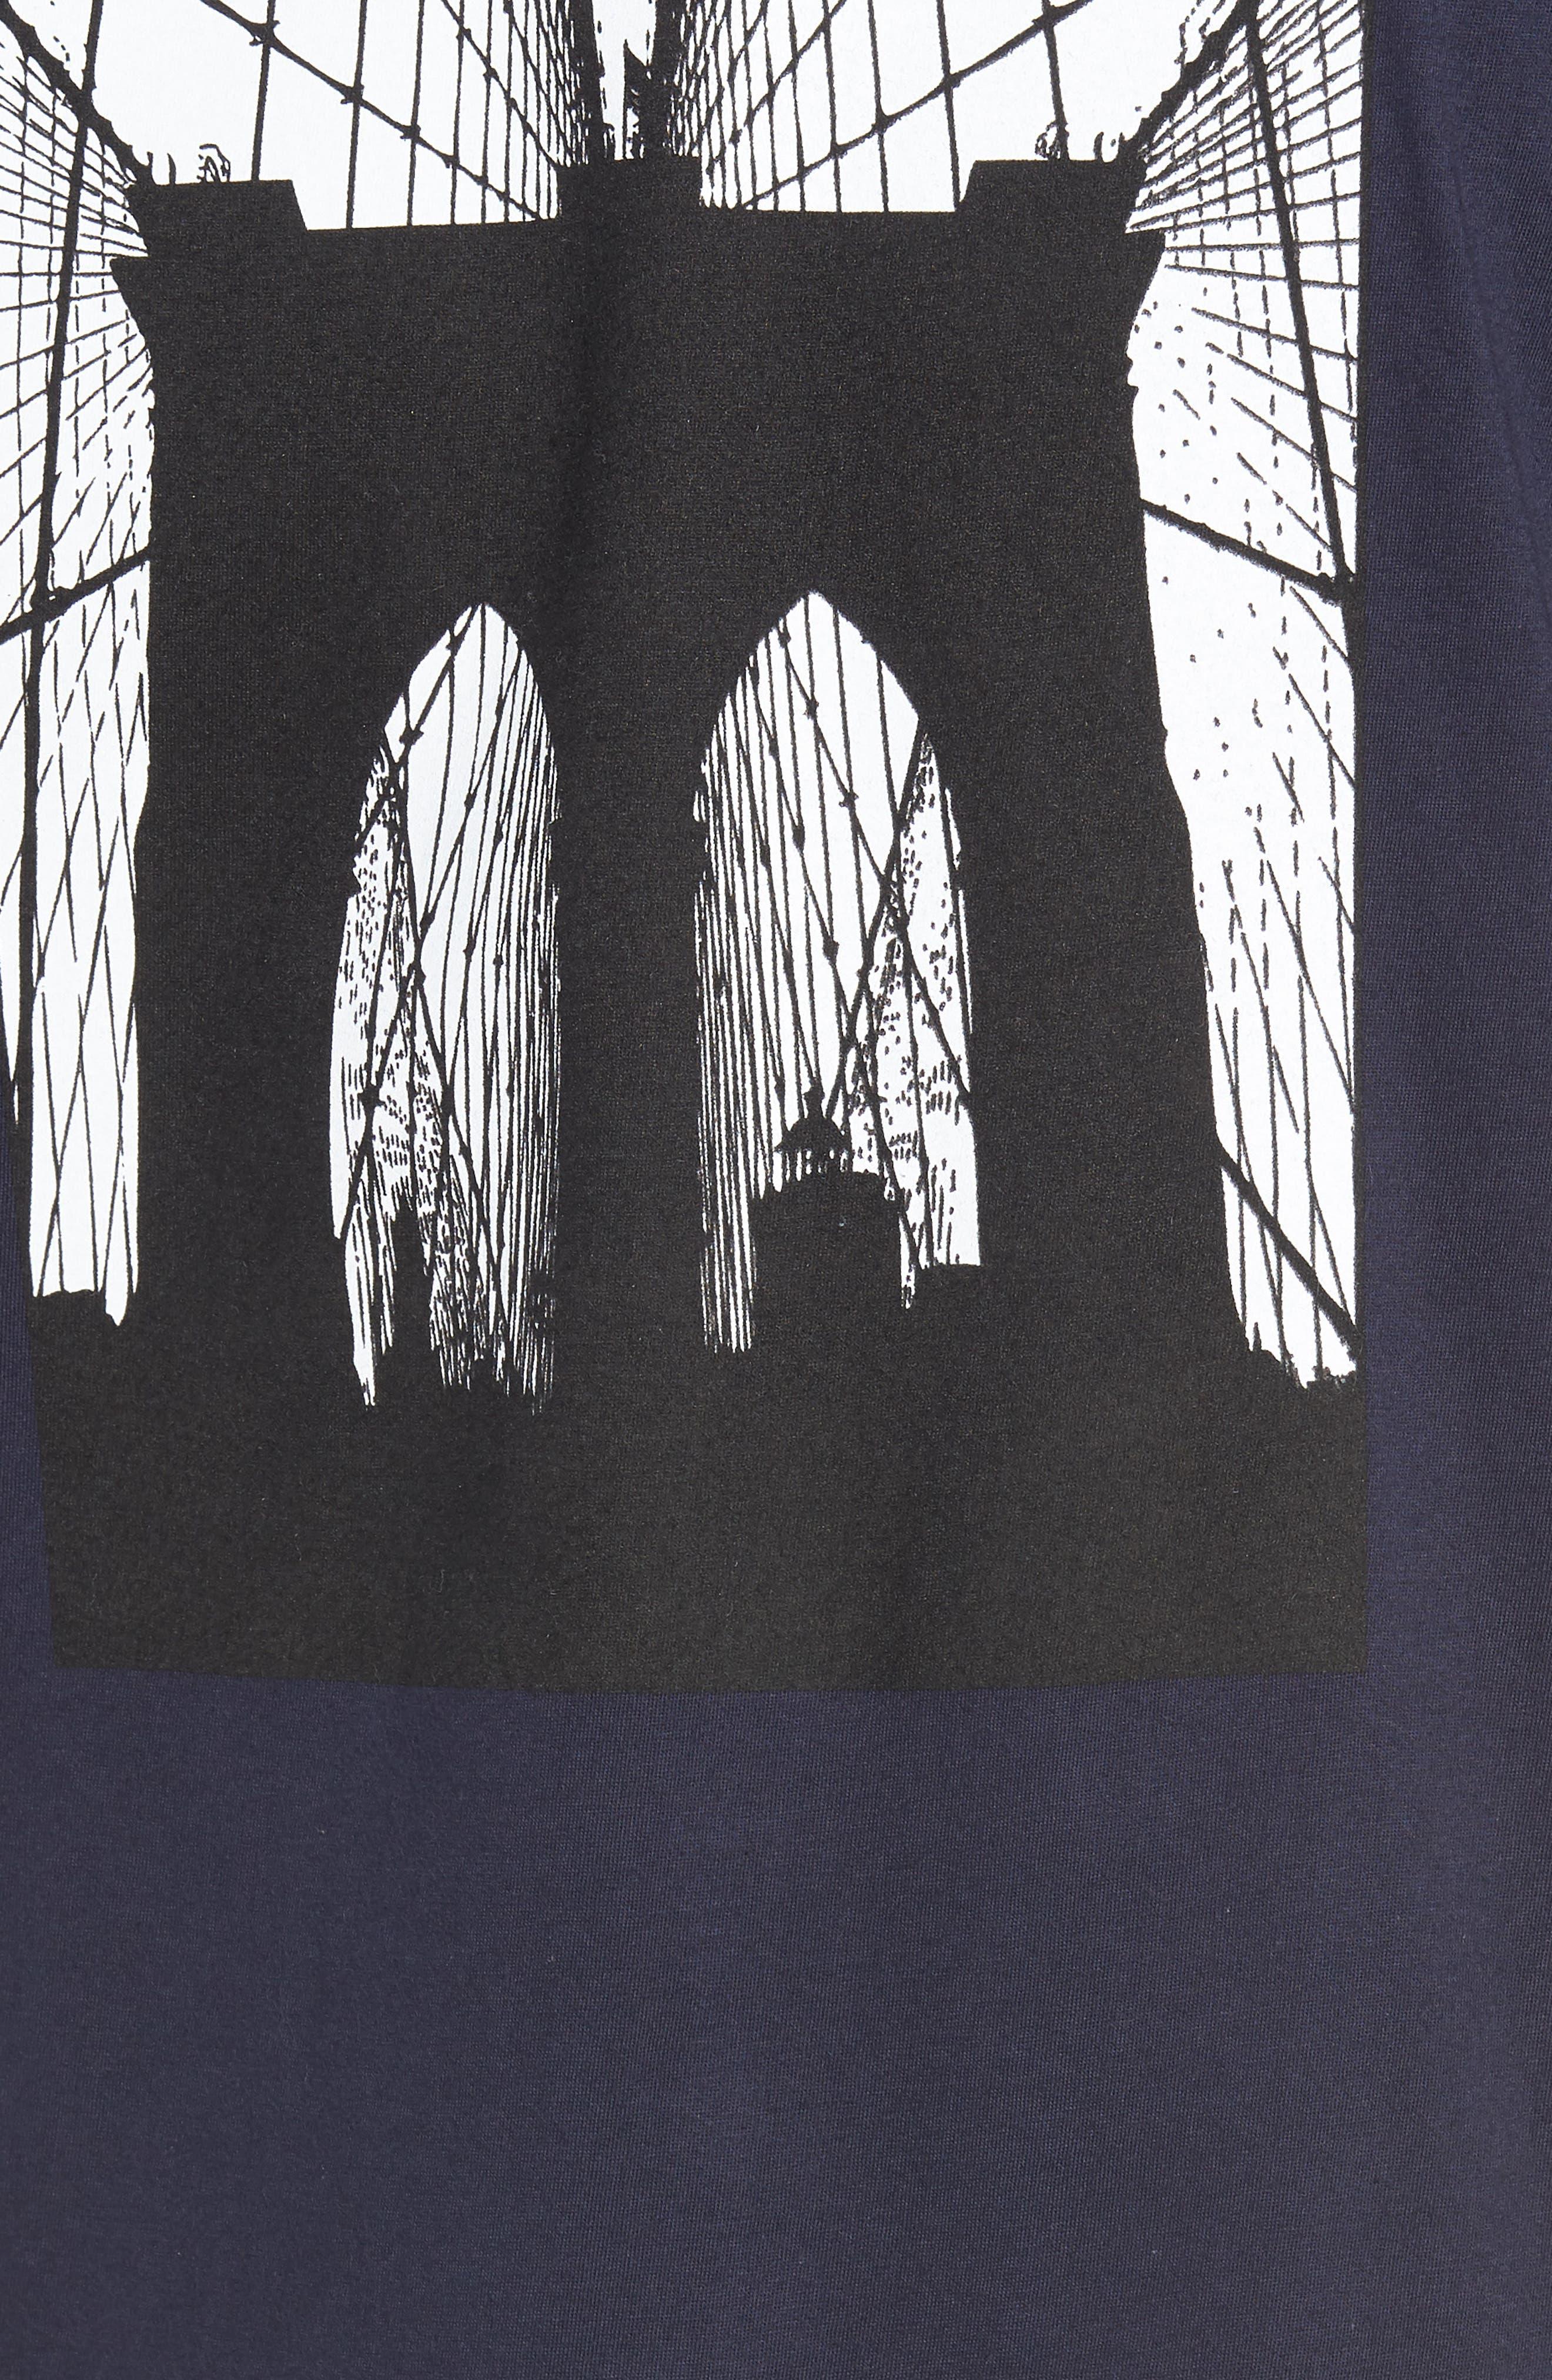 Brooklyn Bridge Graphic T-Shirt,                             Alternate thumbnail 10, color,